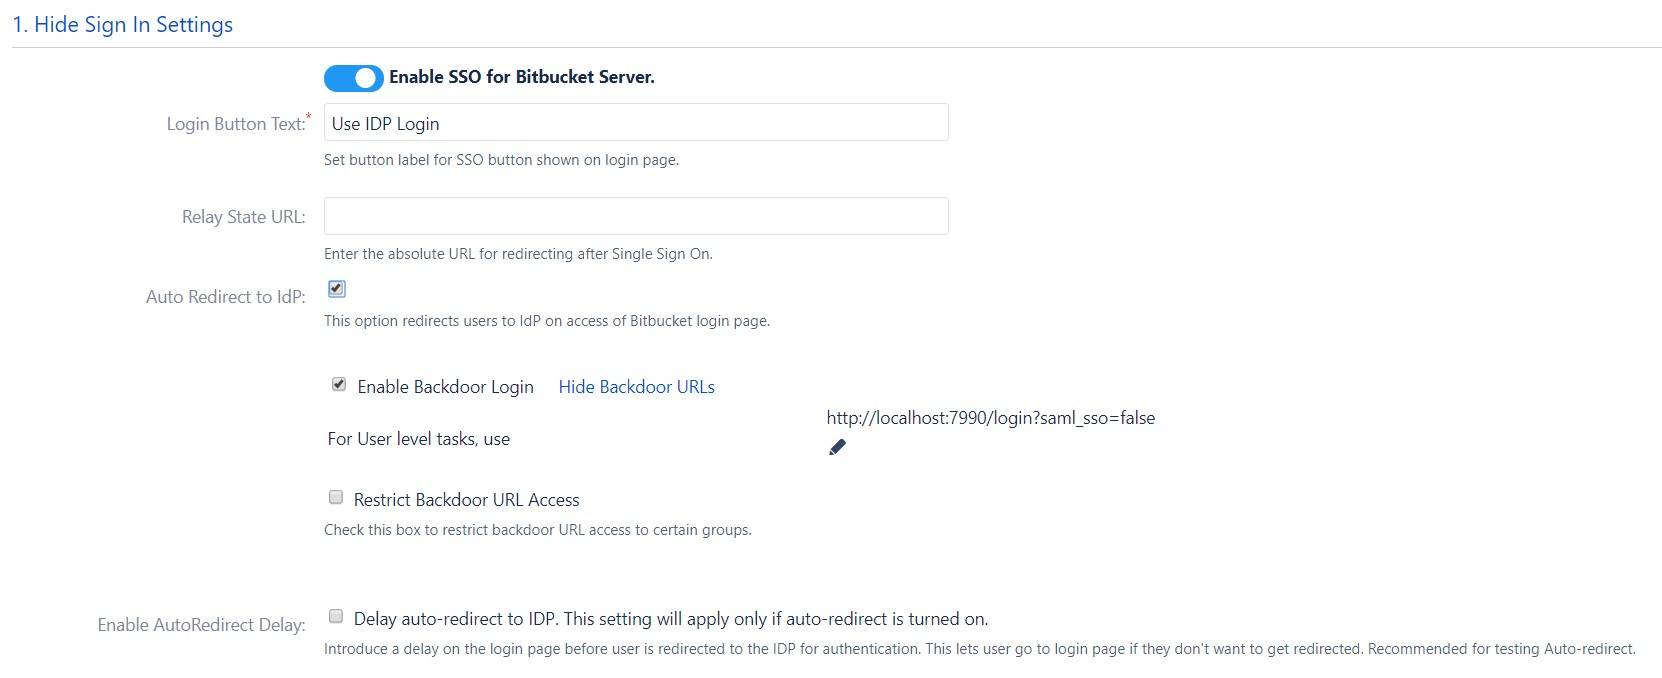 SAML Single Sign On (SSO) into Bitbucket Service Provider, Sign In Settings